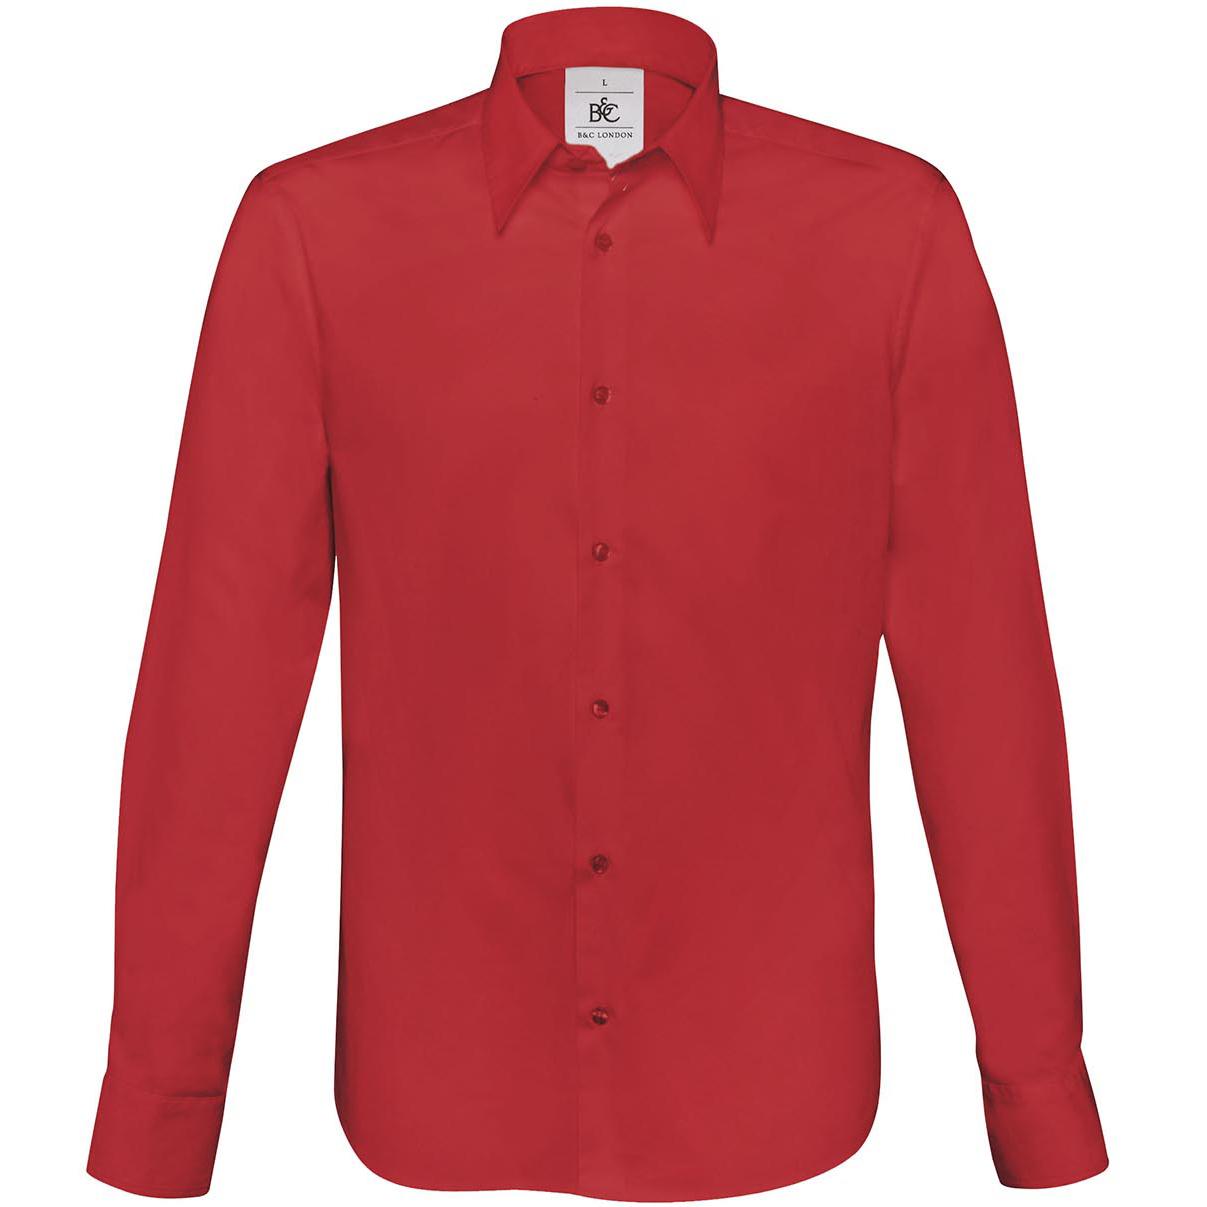 B&C Mens London Long Sleeve Poplin Shirt (S) (Deep Red)